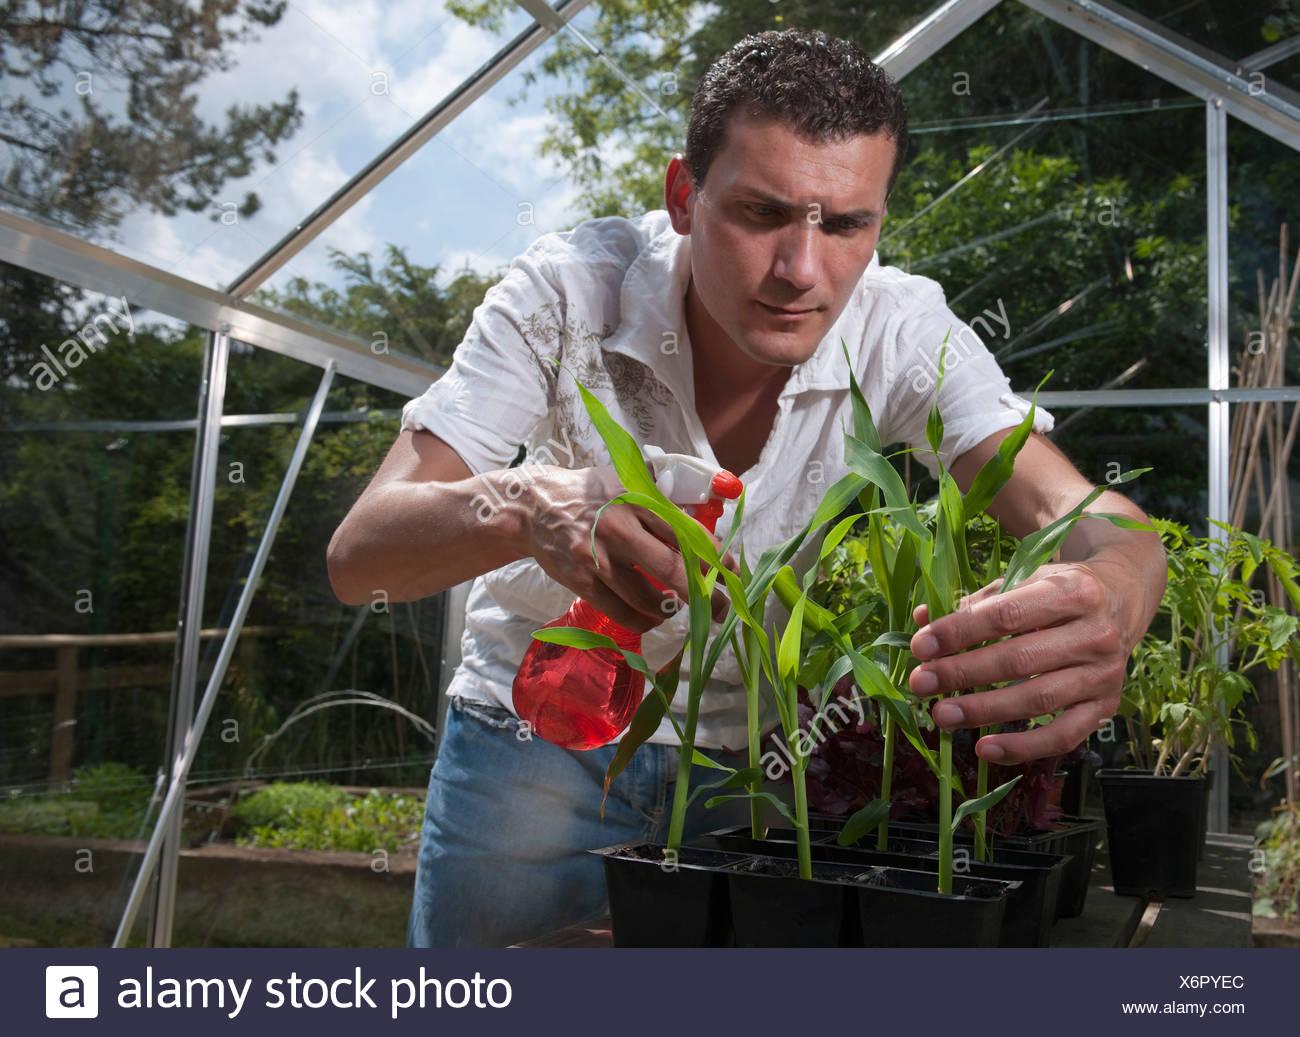 Man In Greenhouse Spraying Plants Stock Photo 279558340 Alamy